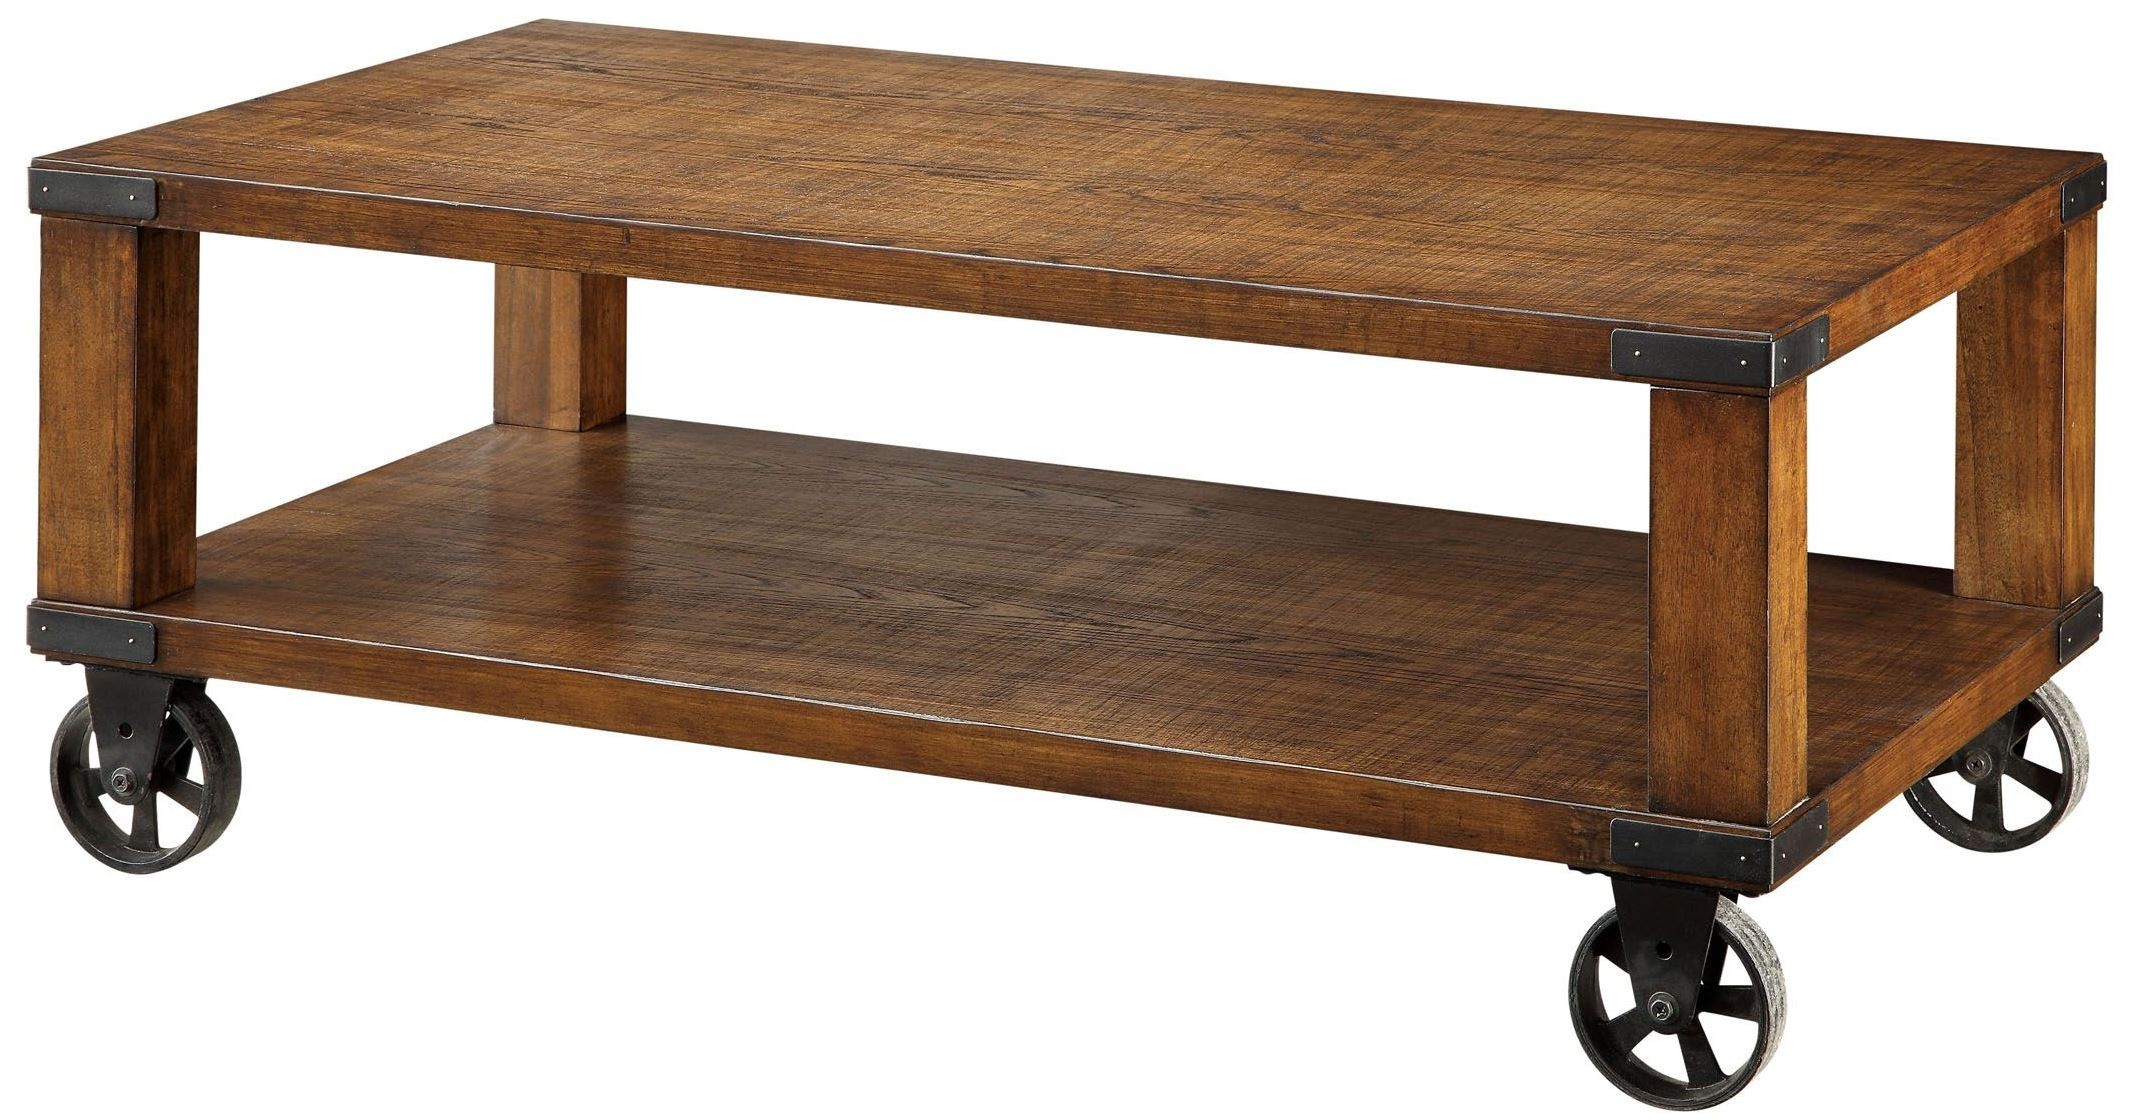 Broadus Dark Oak Coffee Table From Furniture Of America Cm4227c Coleman Furniture